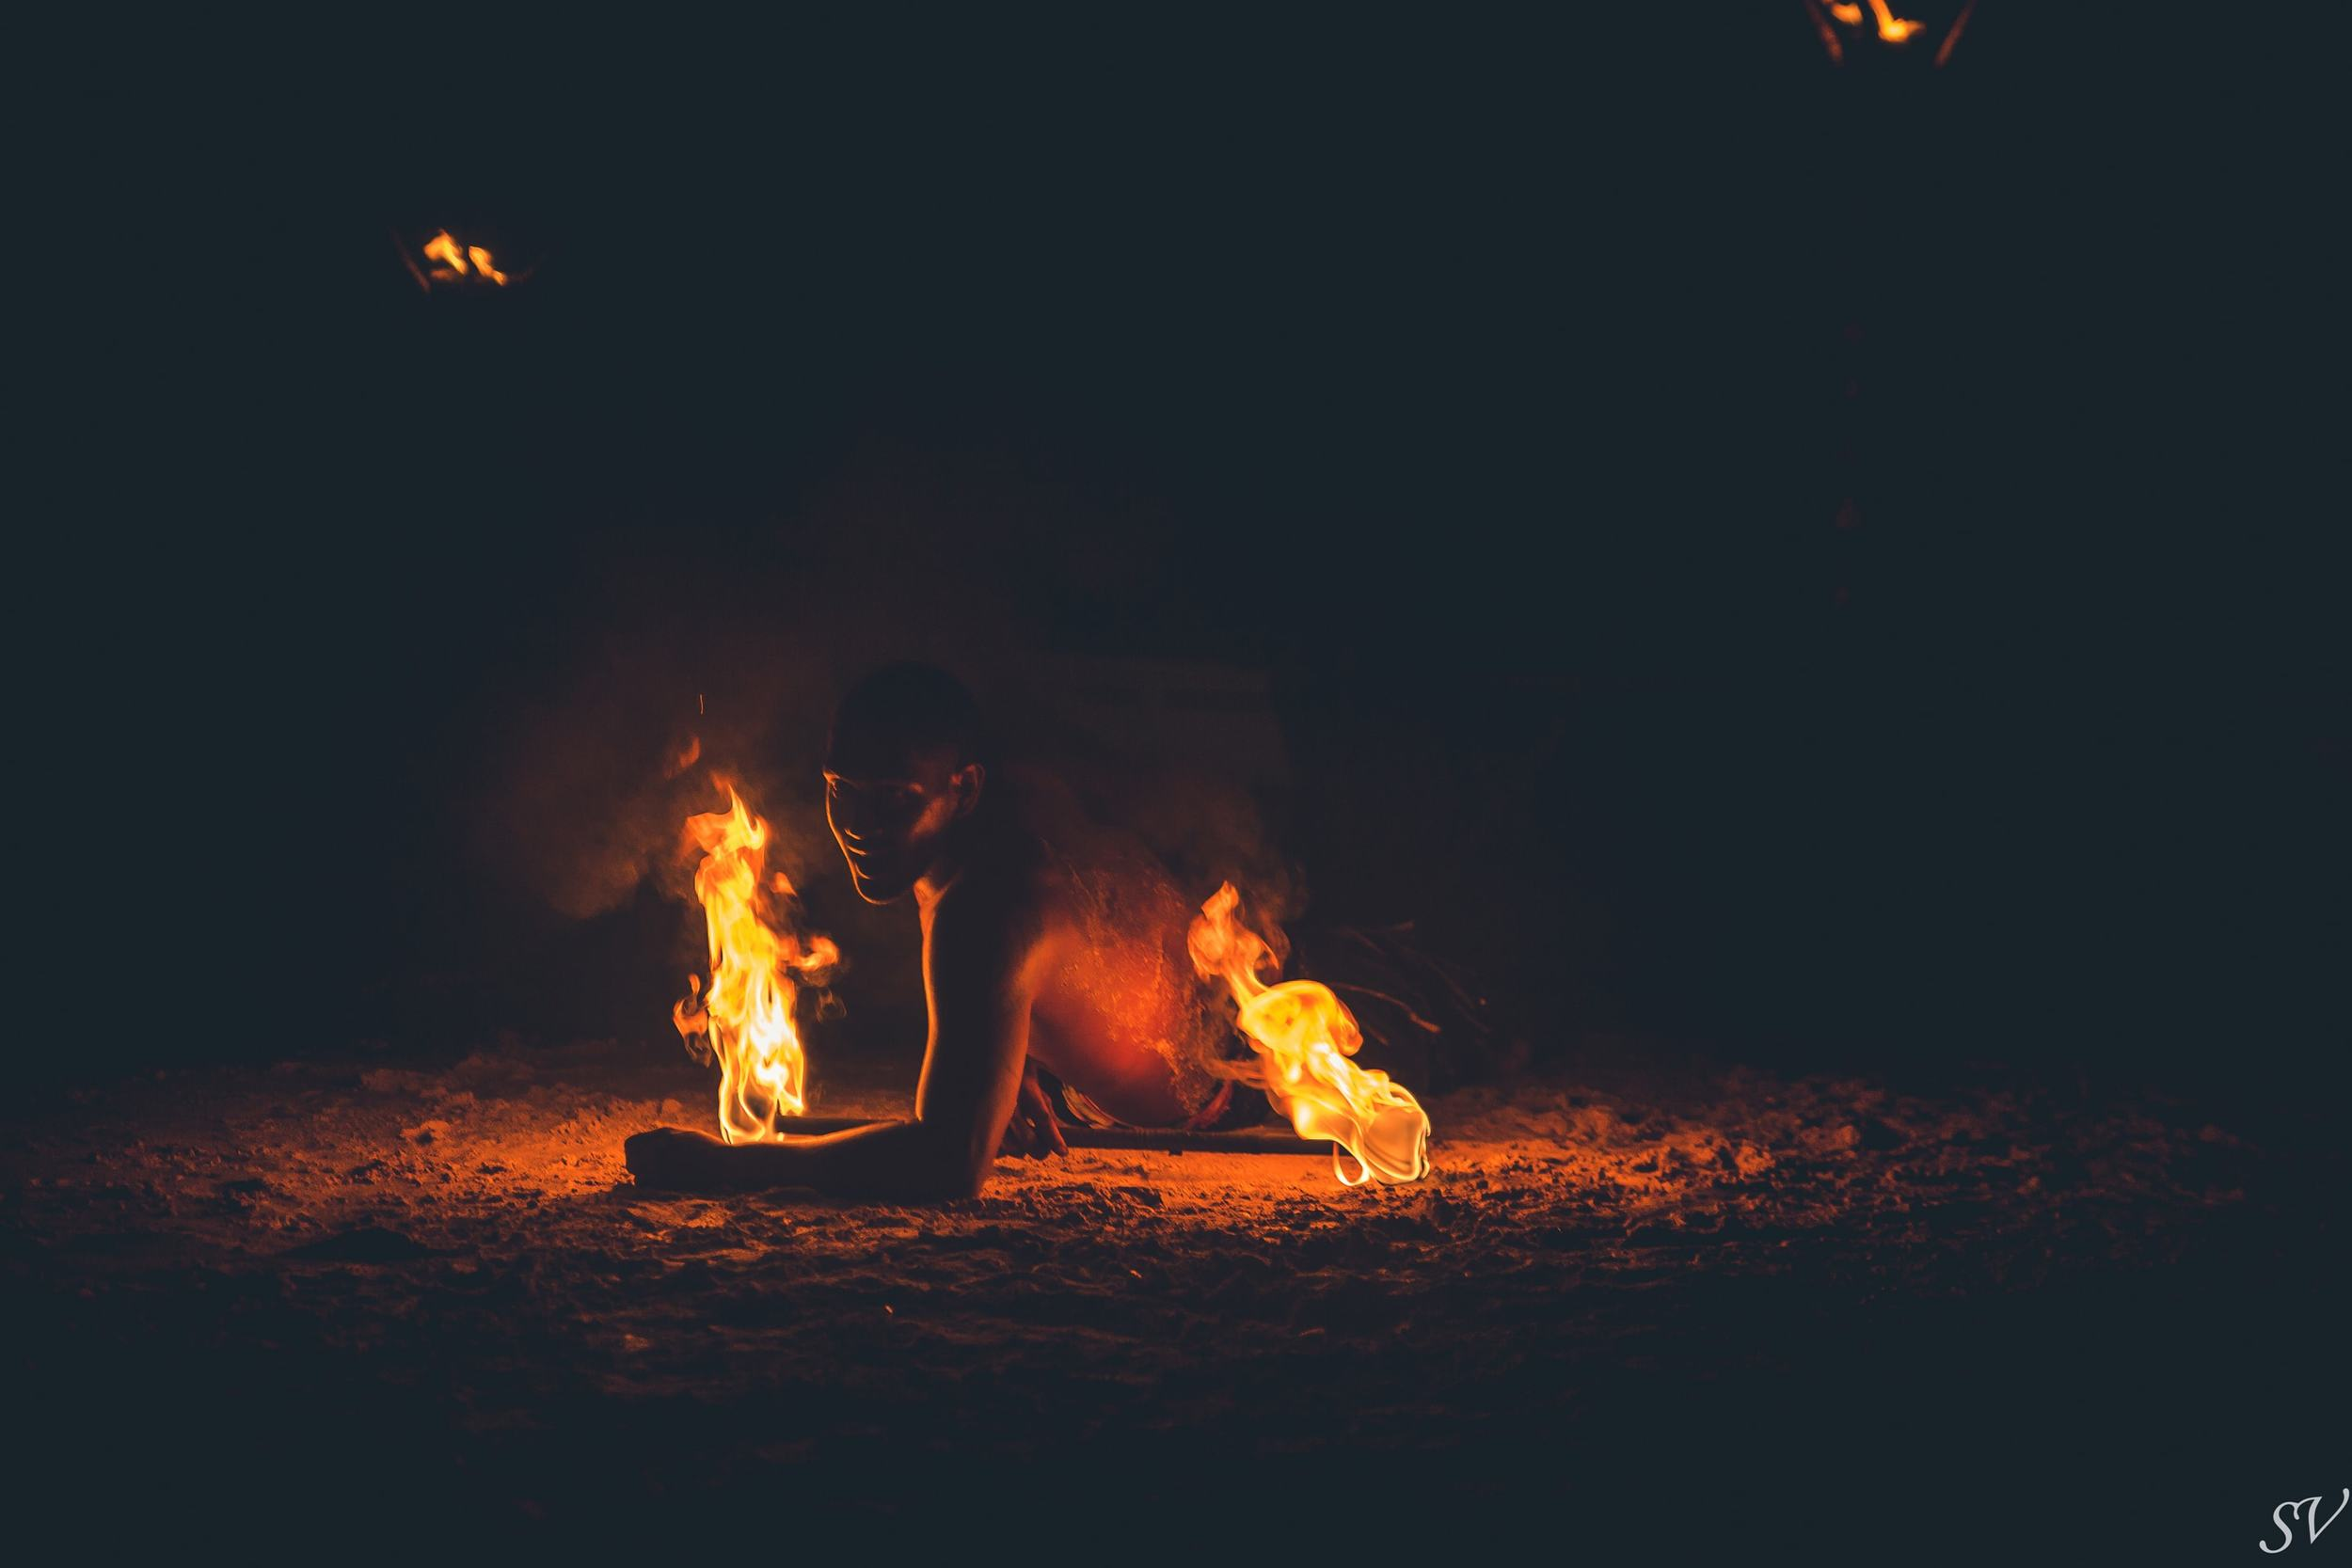 Fire dancer during a destination wedding in Moorea, Tahiti